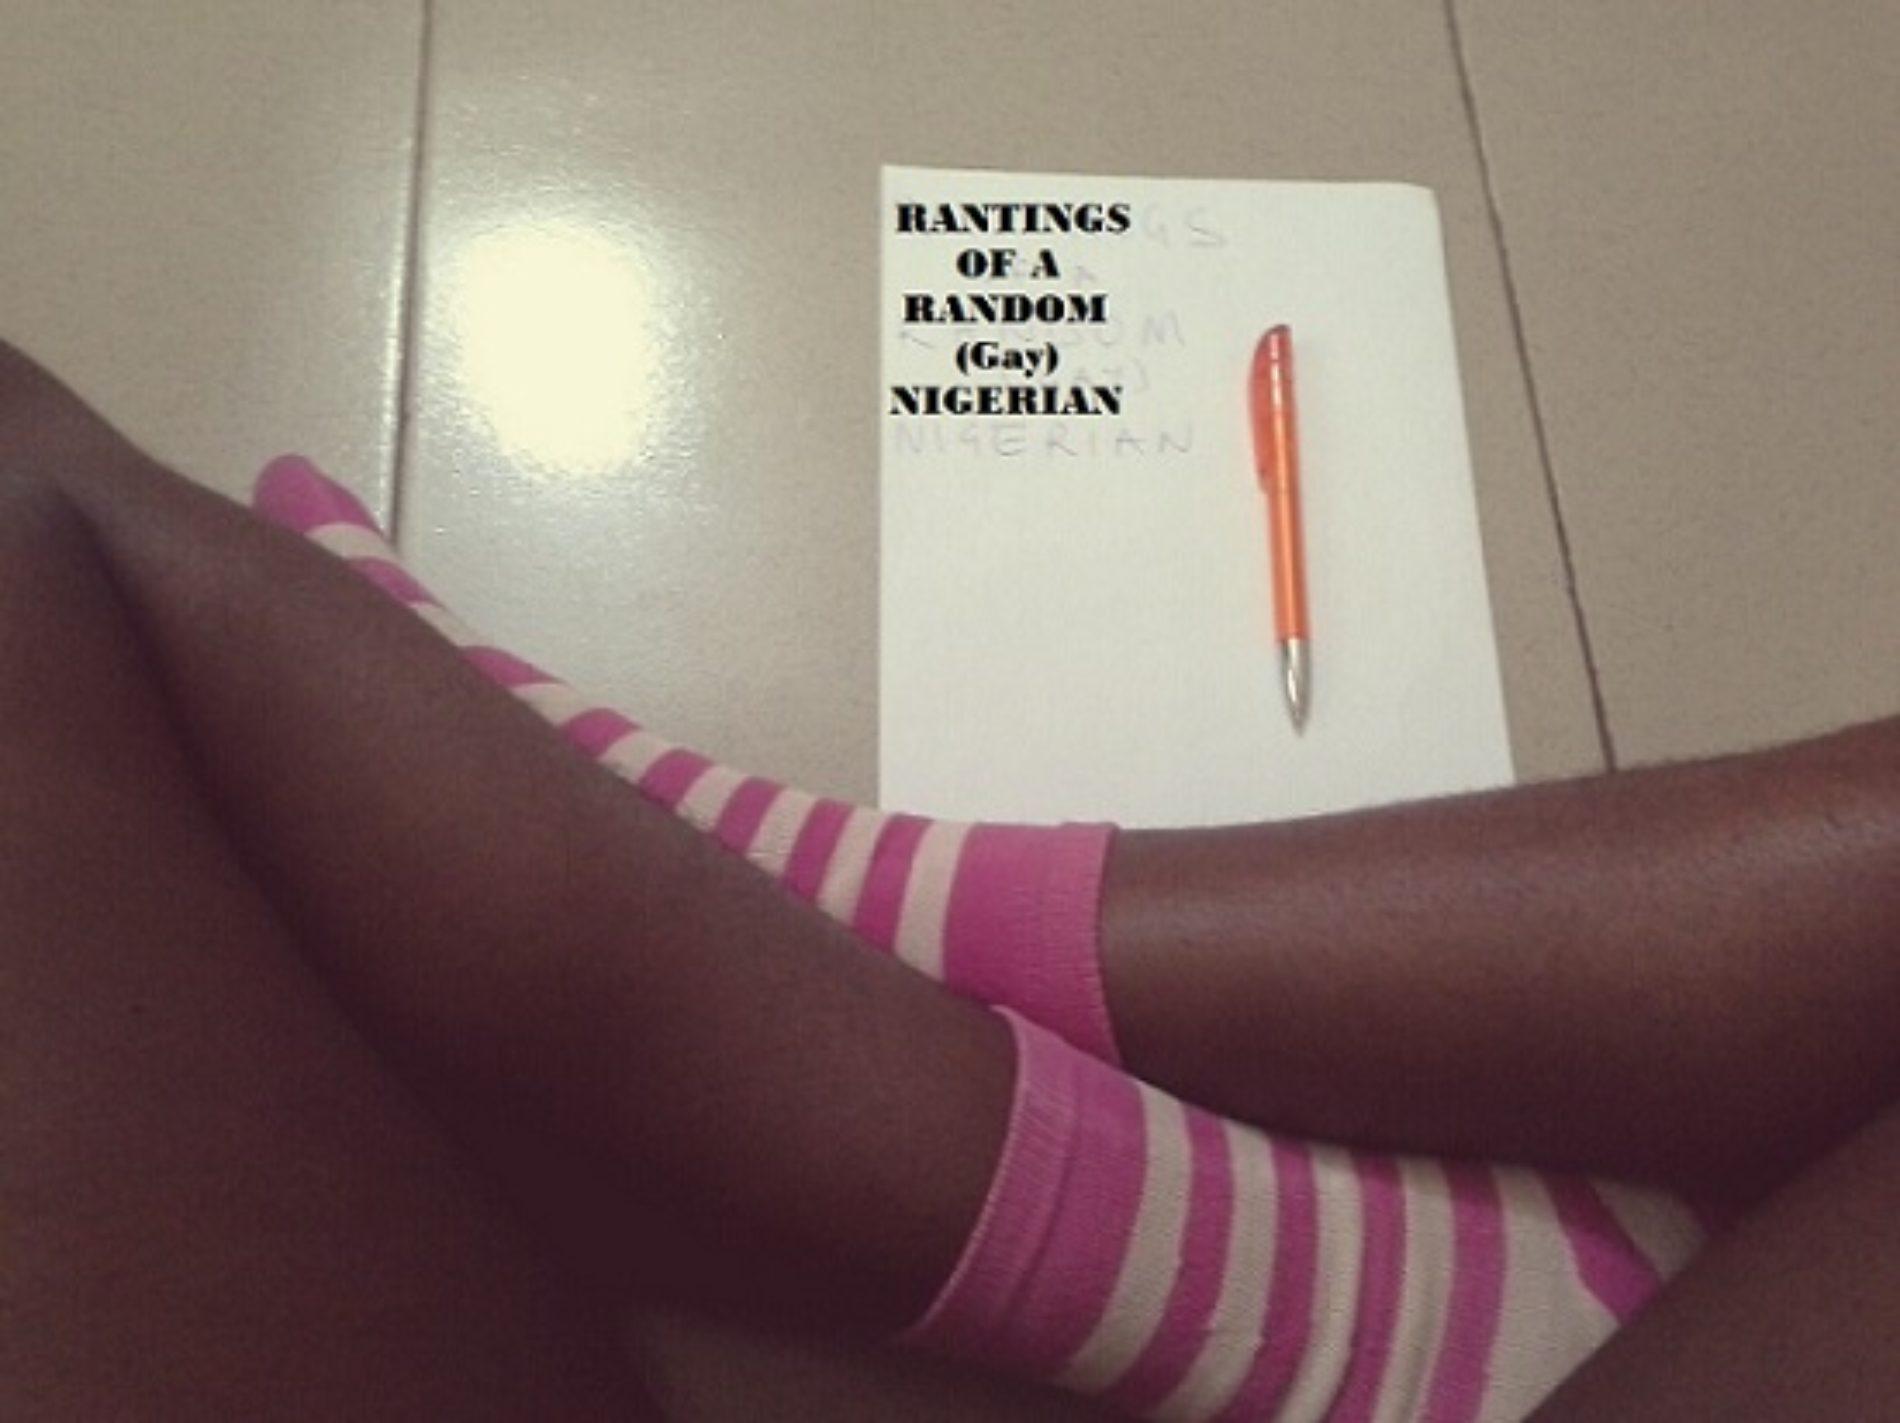 RANTINGS OF A RANDOM (Gay) NIGERIAN (Entry 2)